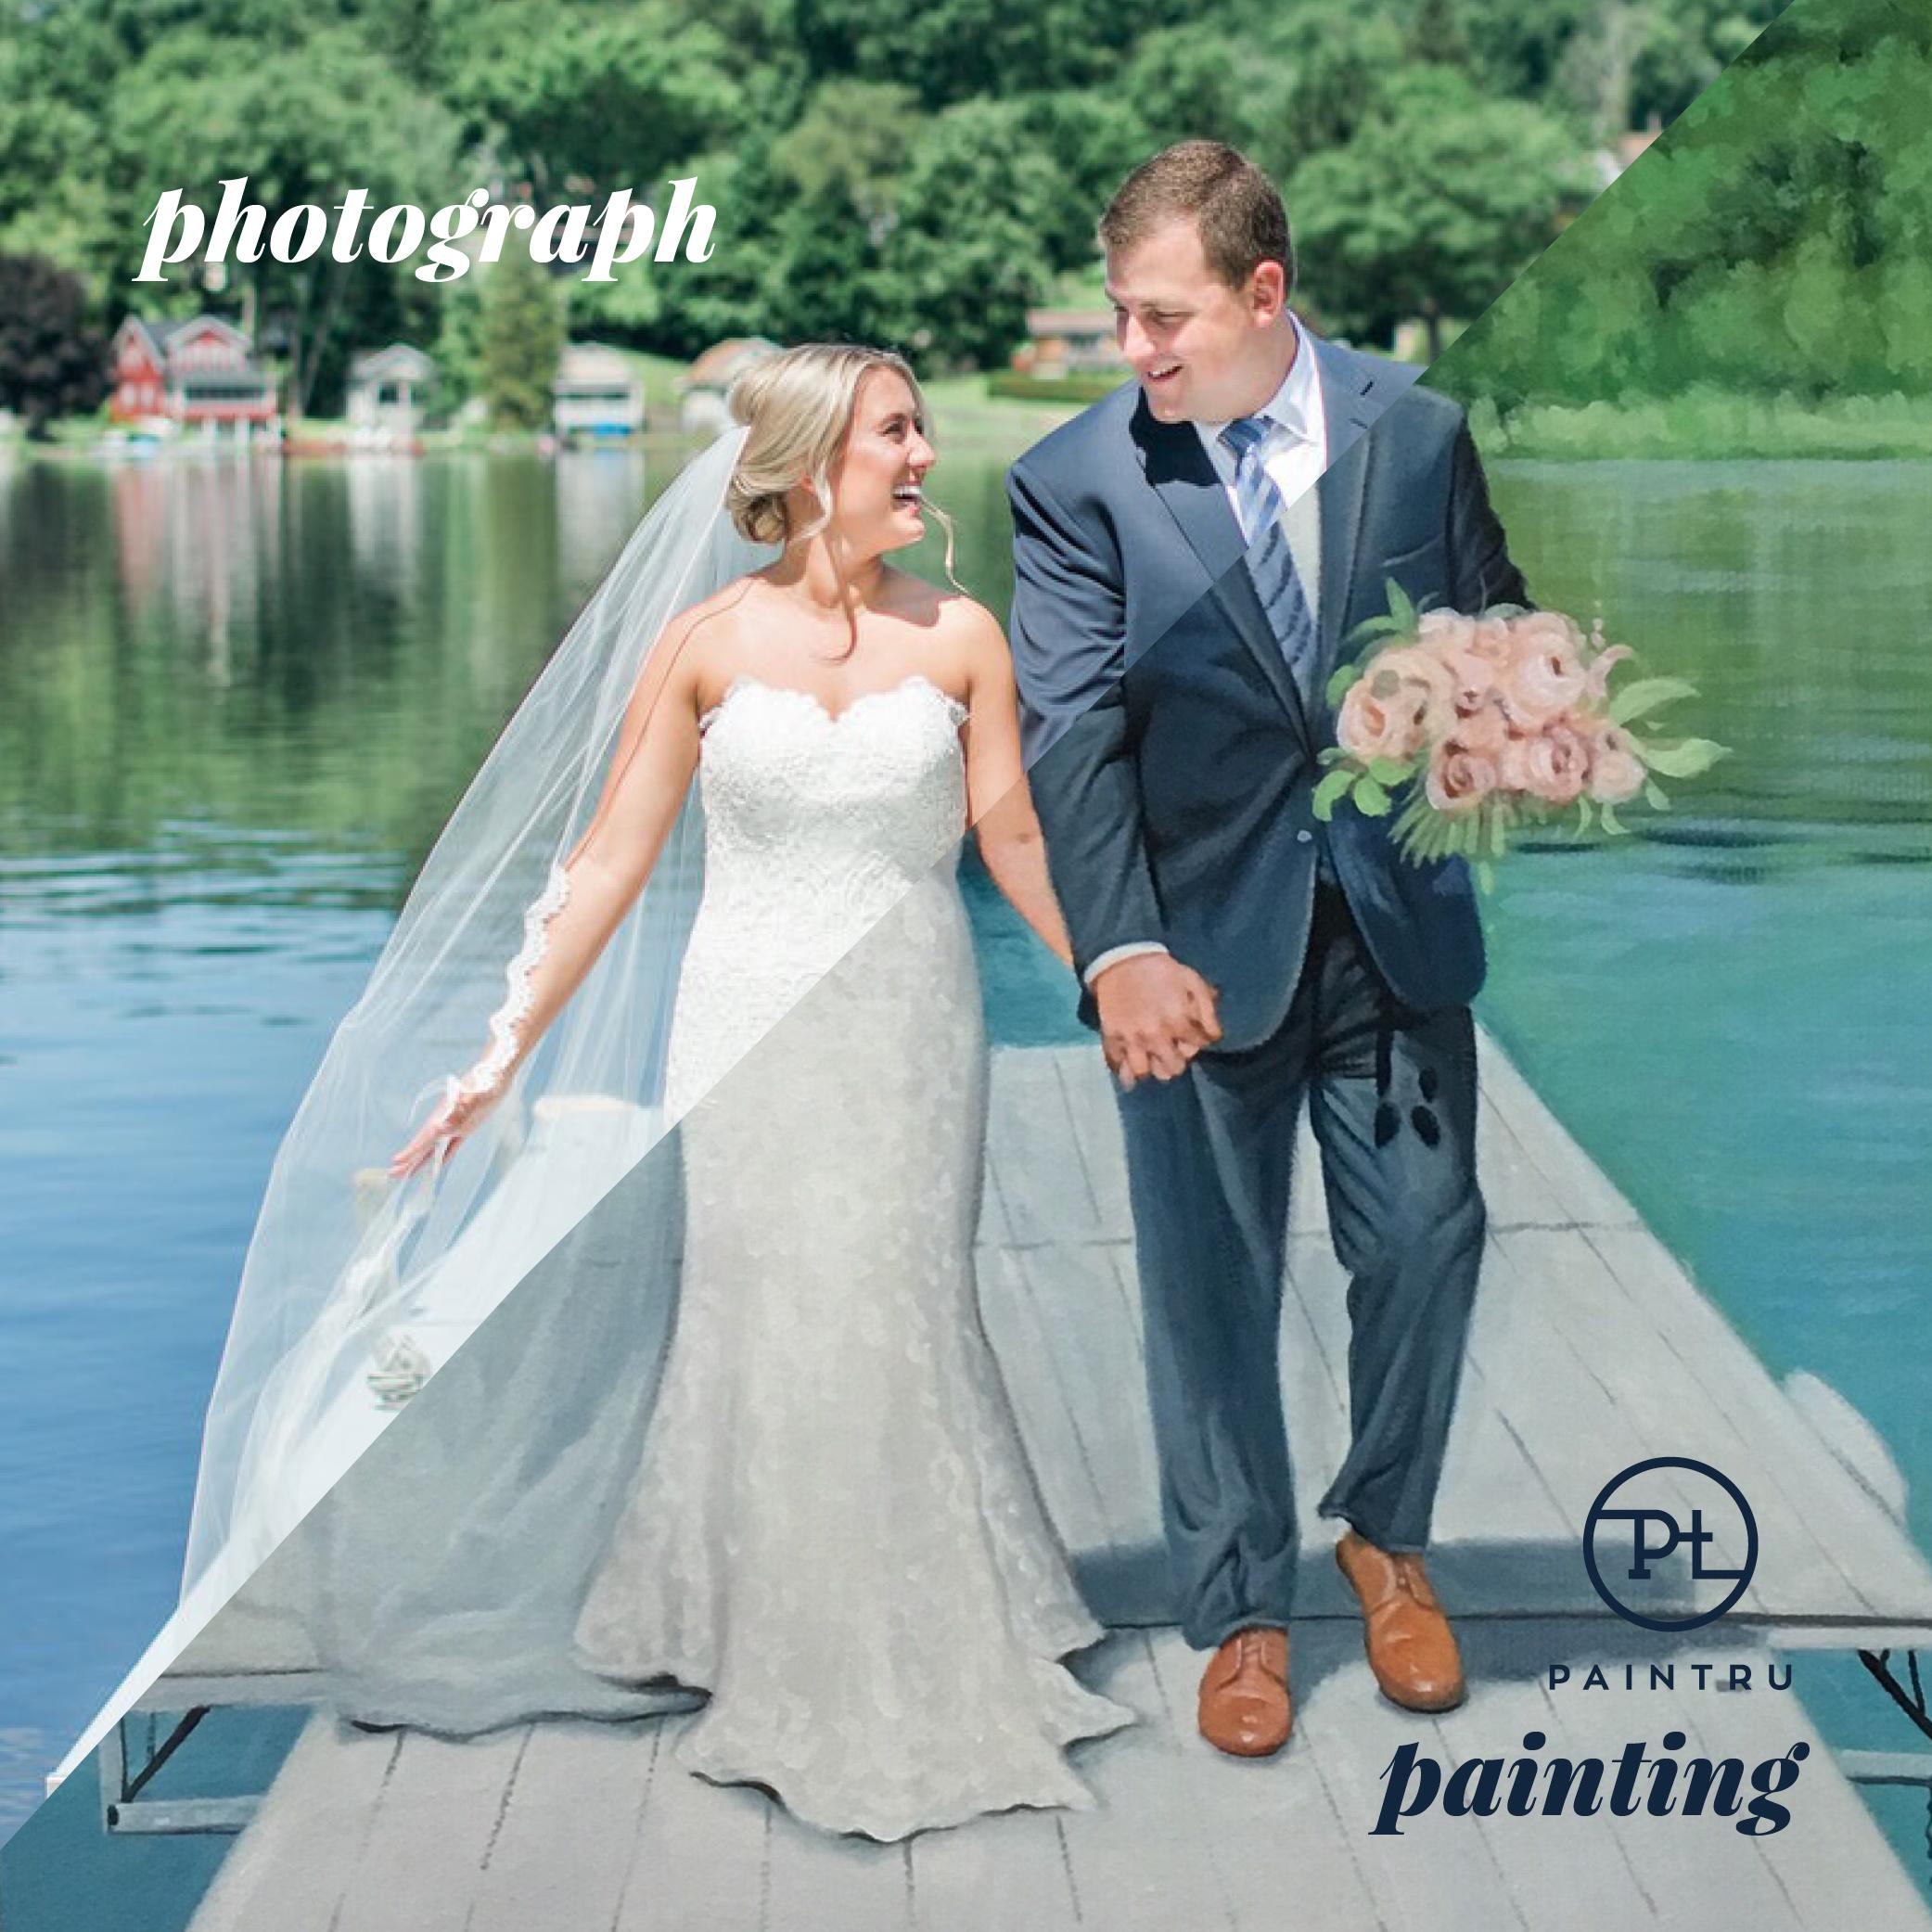 lake-wedding-photo-to-painting